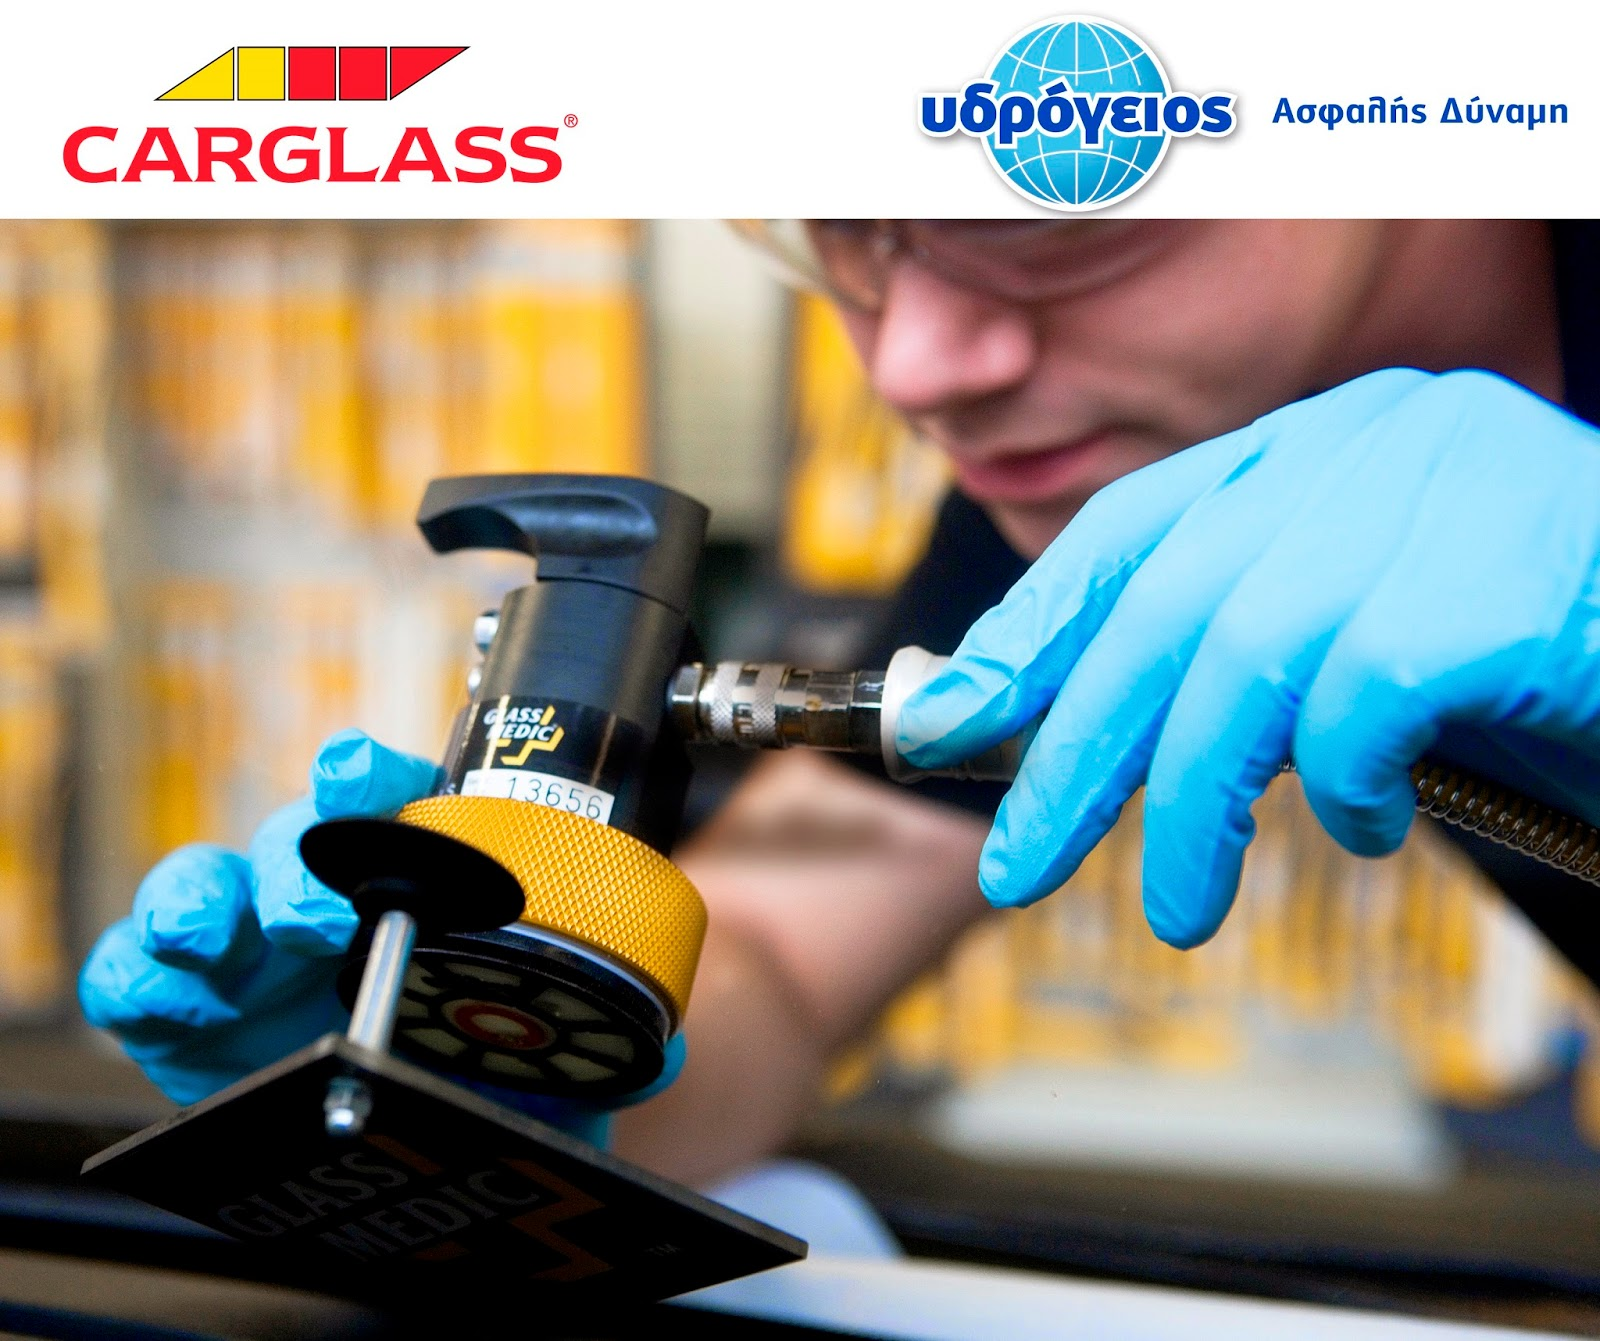 CARGLASS®: Συνεργασία με Υδρόγειο Ασφαλιστική